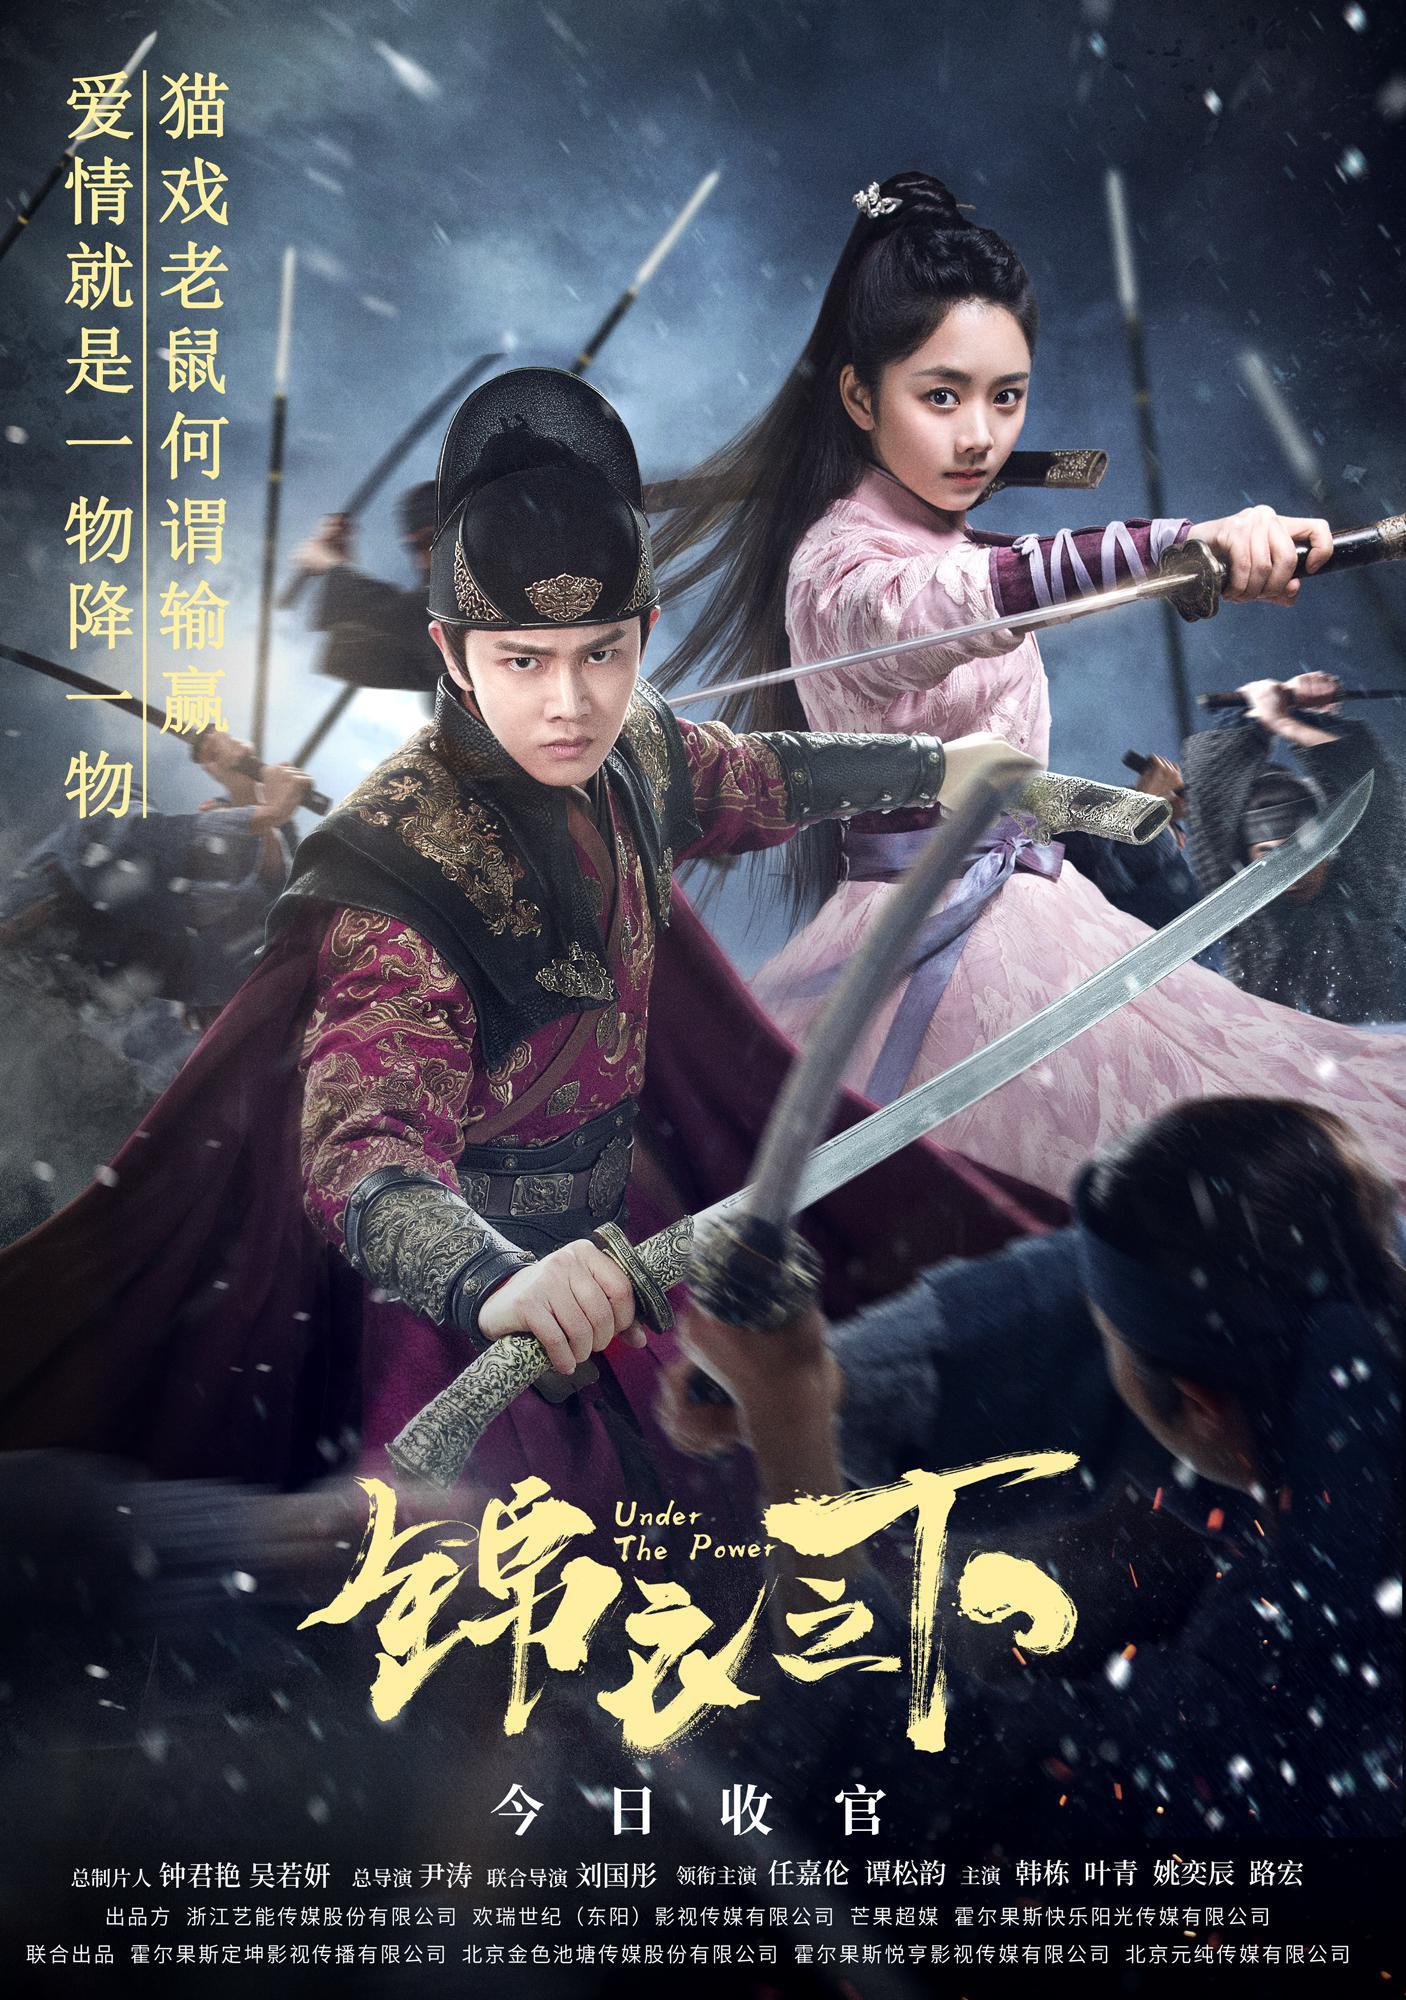 phim Trung Quốc 2020 Cẩm Y Chi Hạ